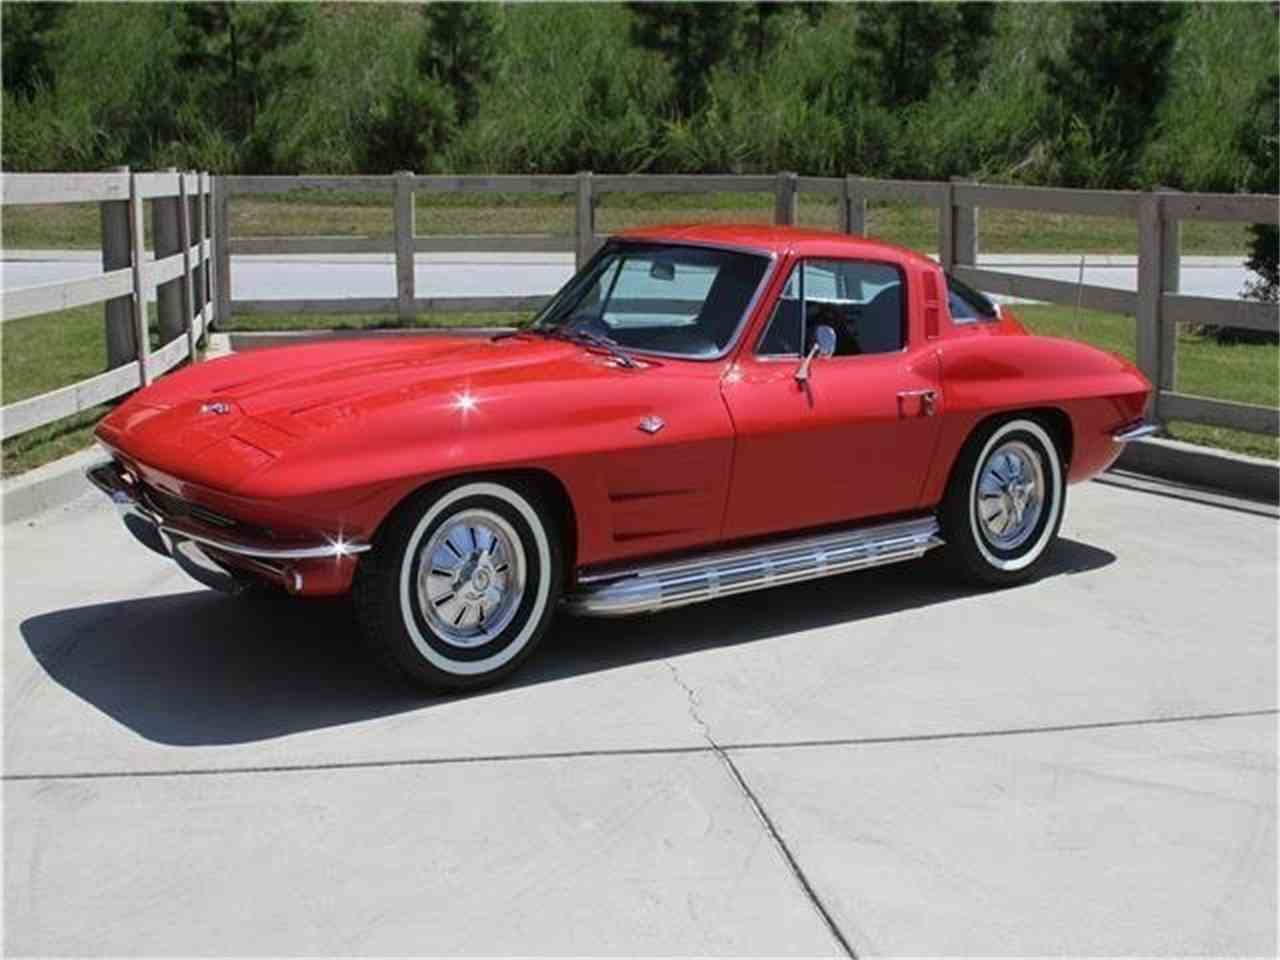 Corvette 1964 chevrolet corvette : 1964 Chevrolet Corvette for Sale | ClassicCars.com | CC-1040119